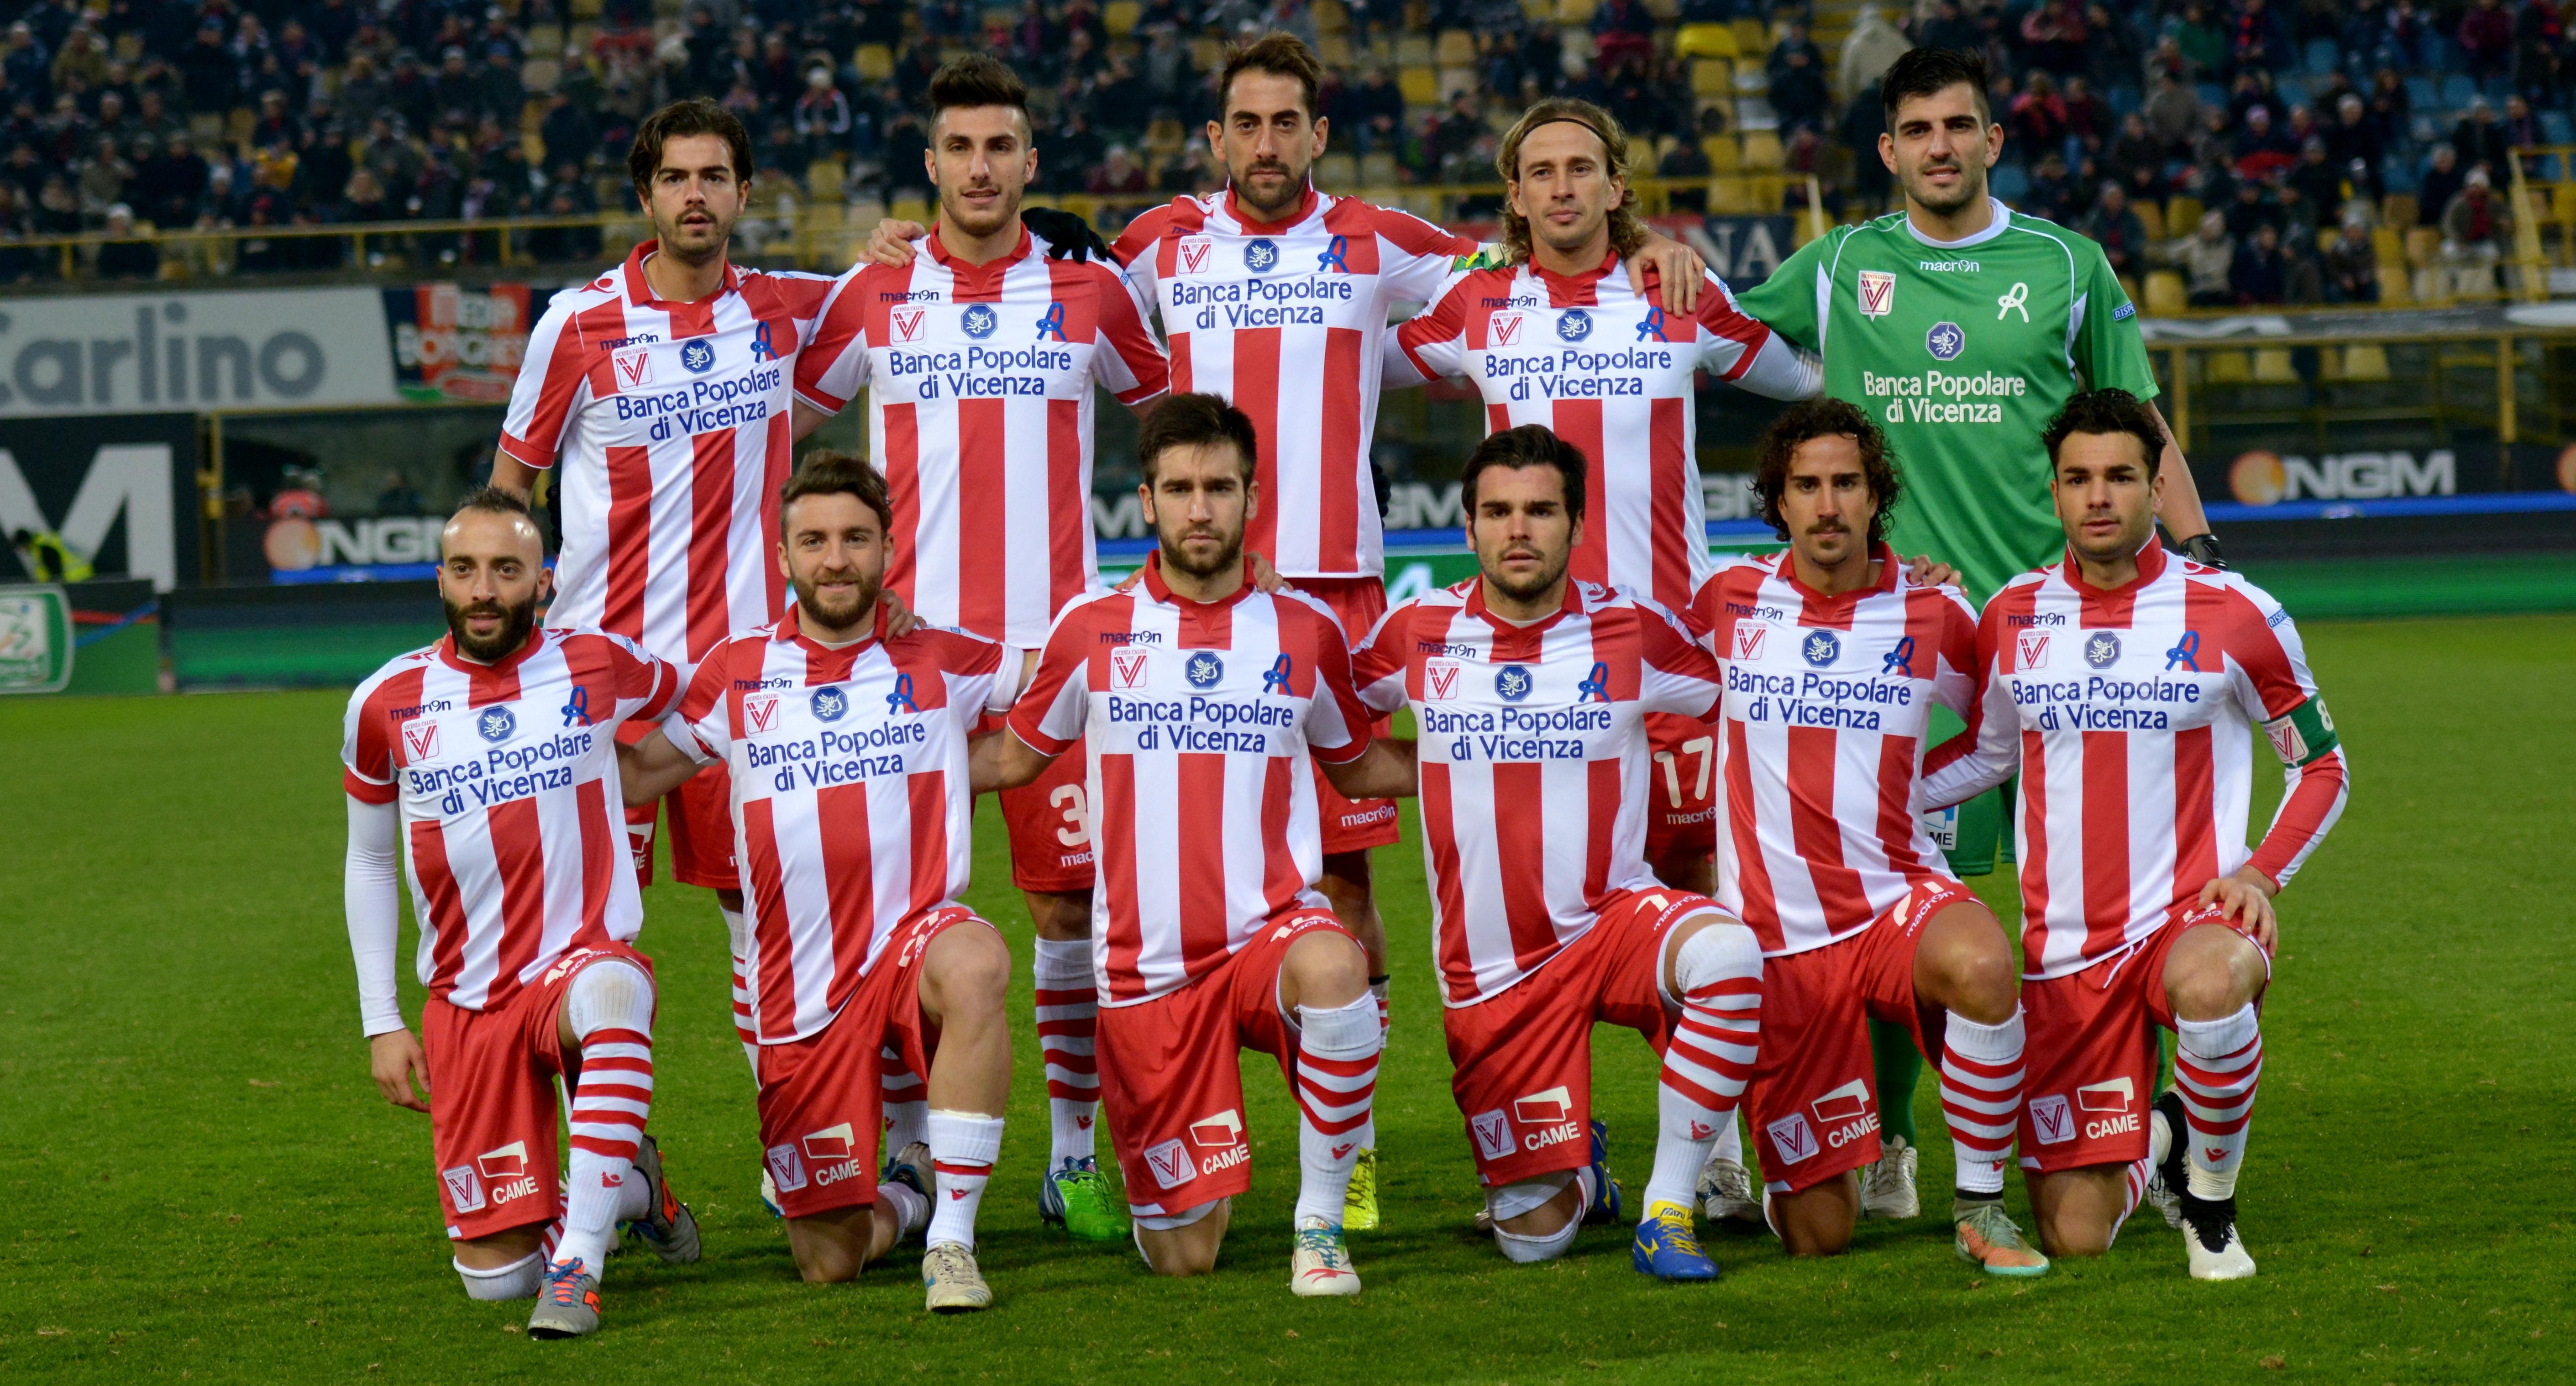 Vicenza_Calcio_2014-2015.jpg